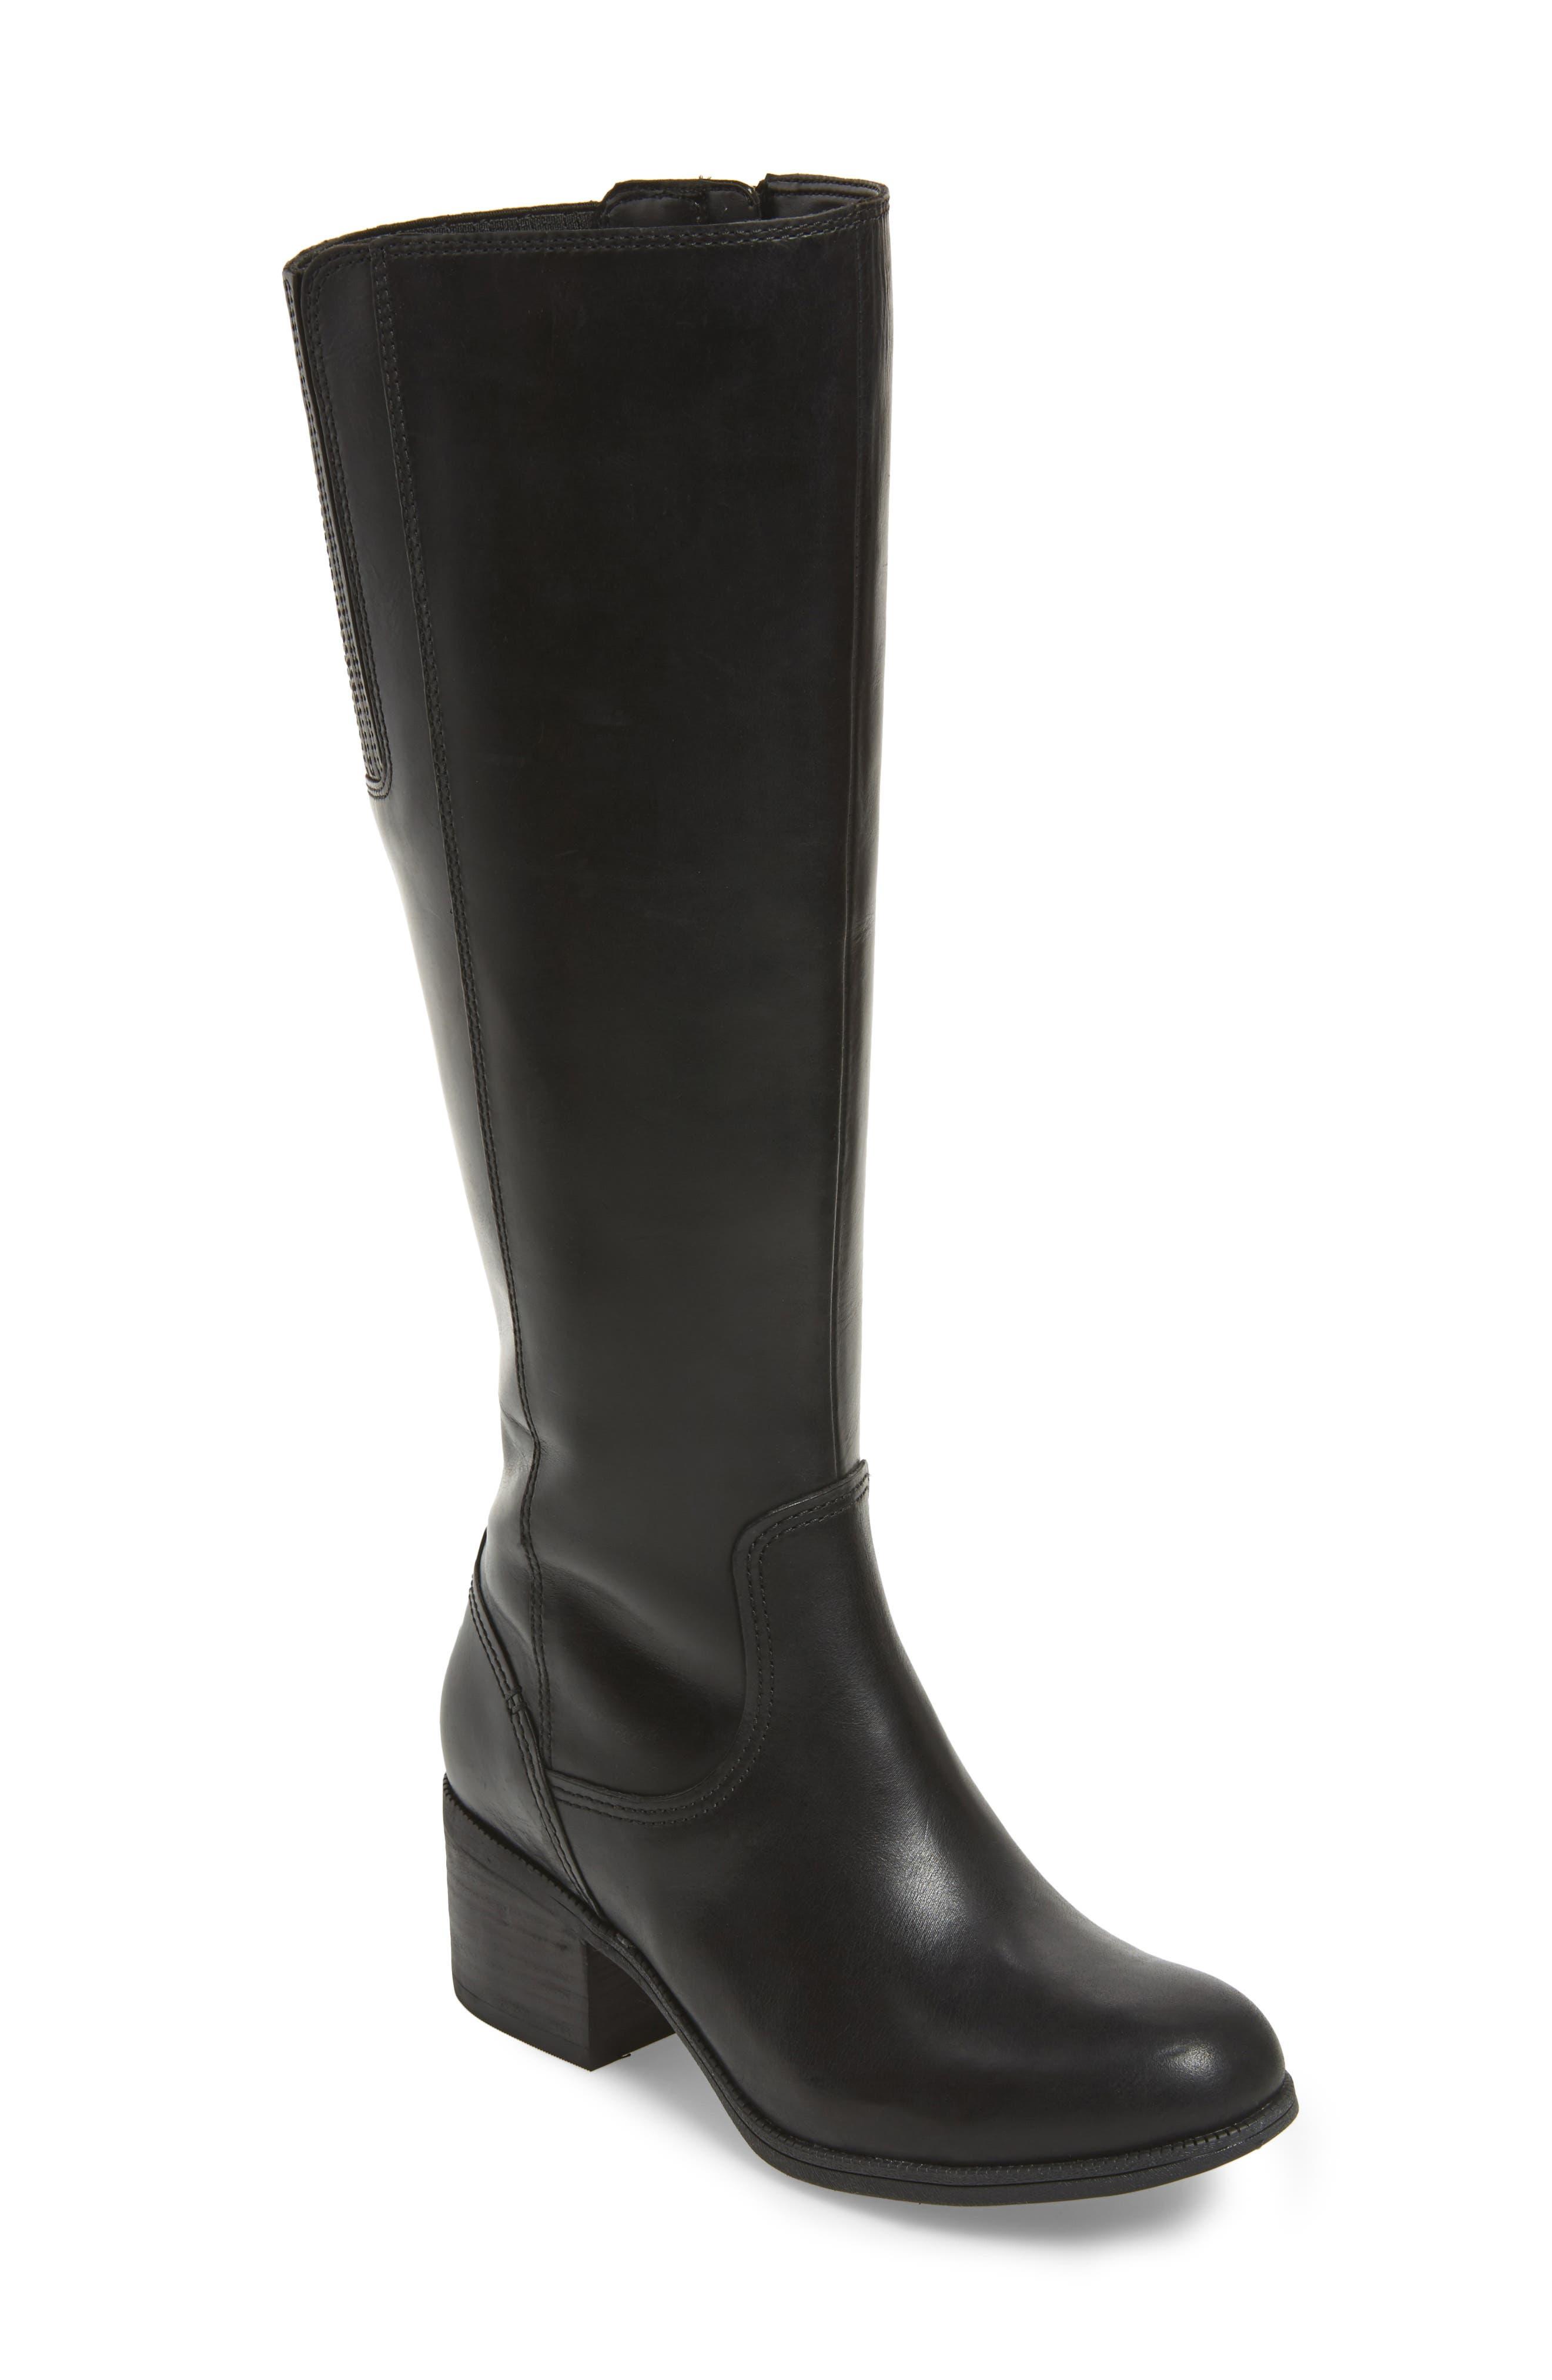 Maypearl Viola Boot,                             Main thumbnail 1, color,                             Black Leather